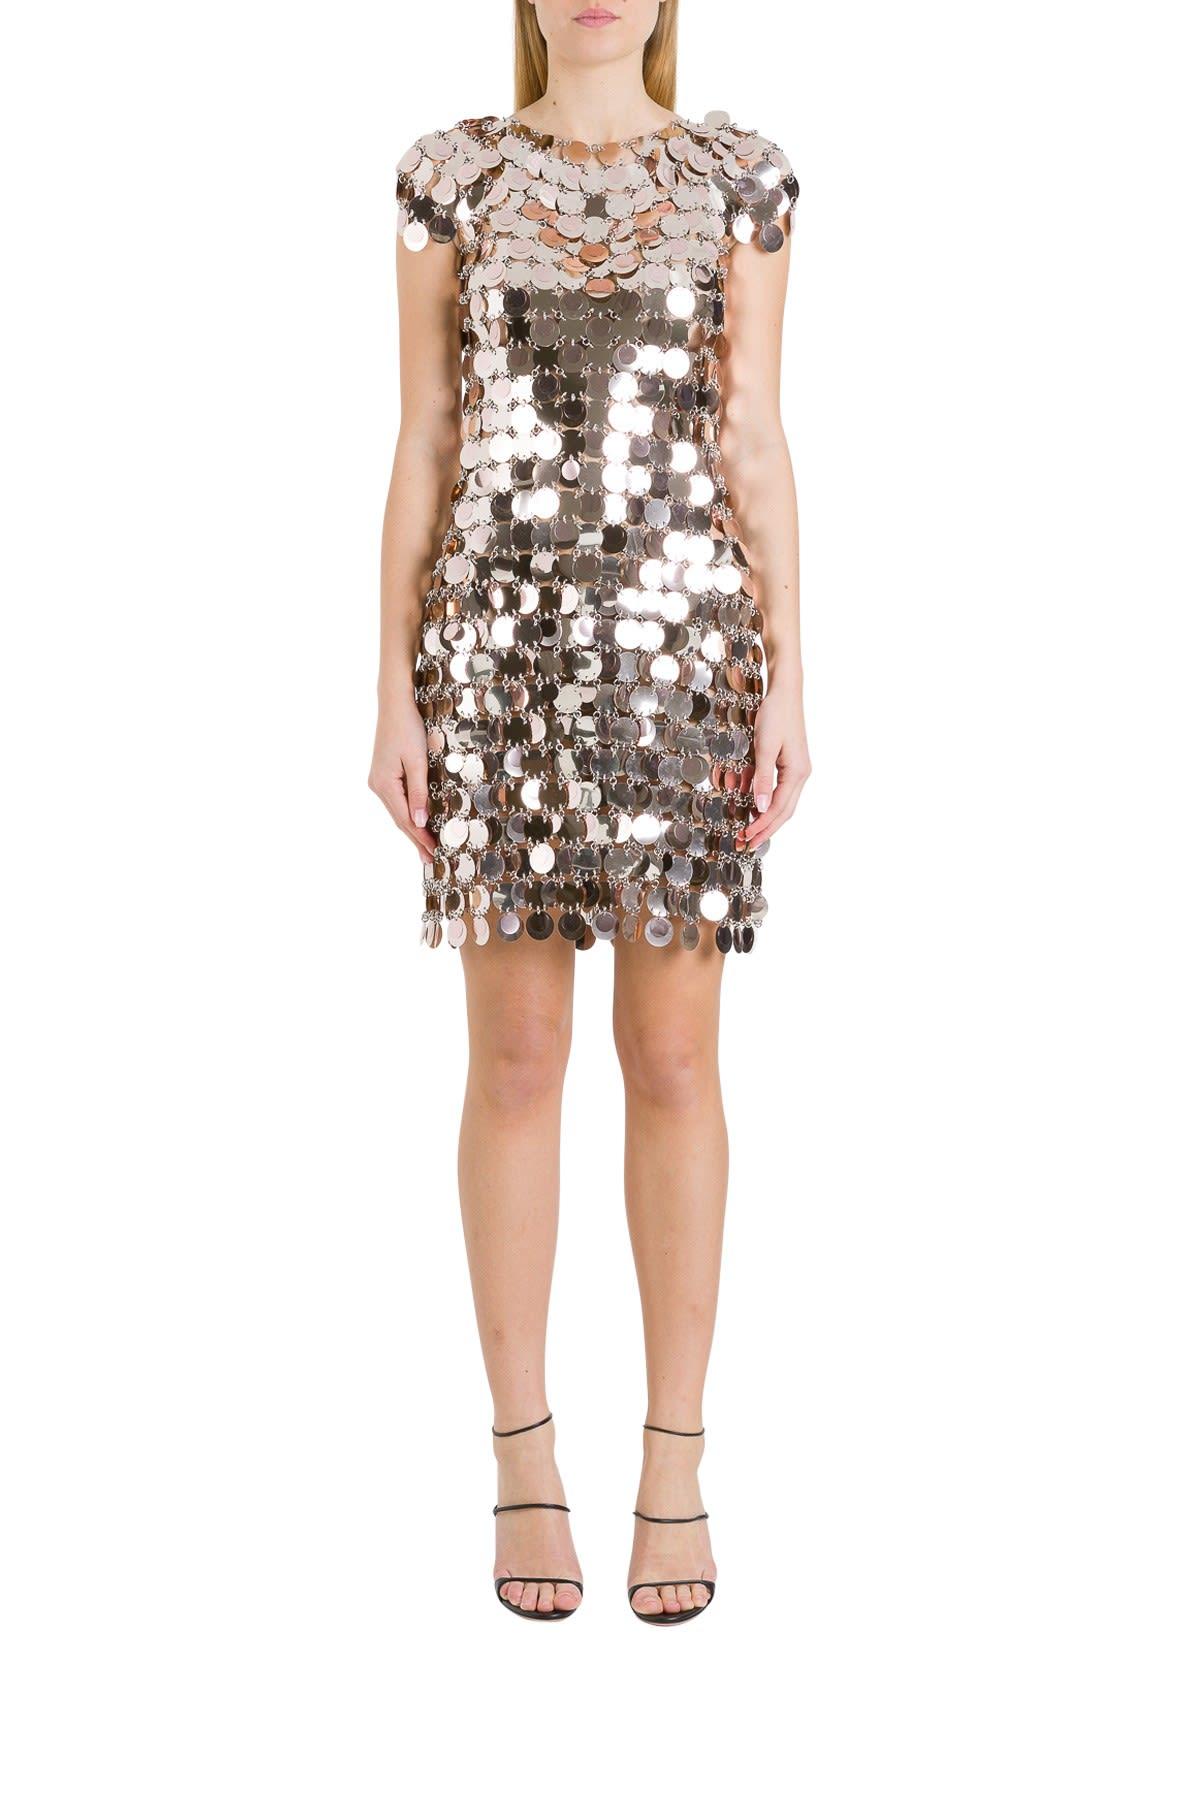 Paco Rabanne Metallic Dress